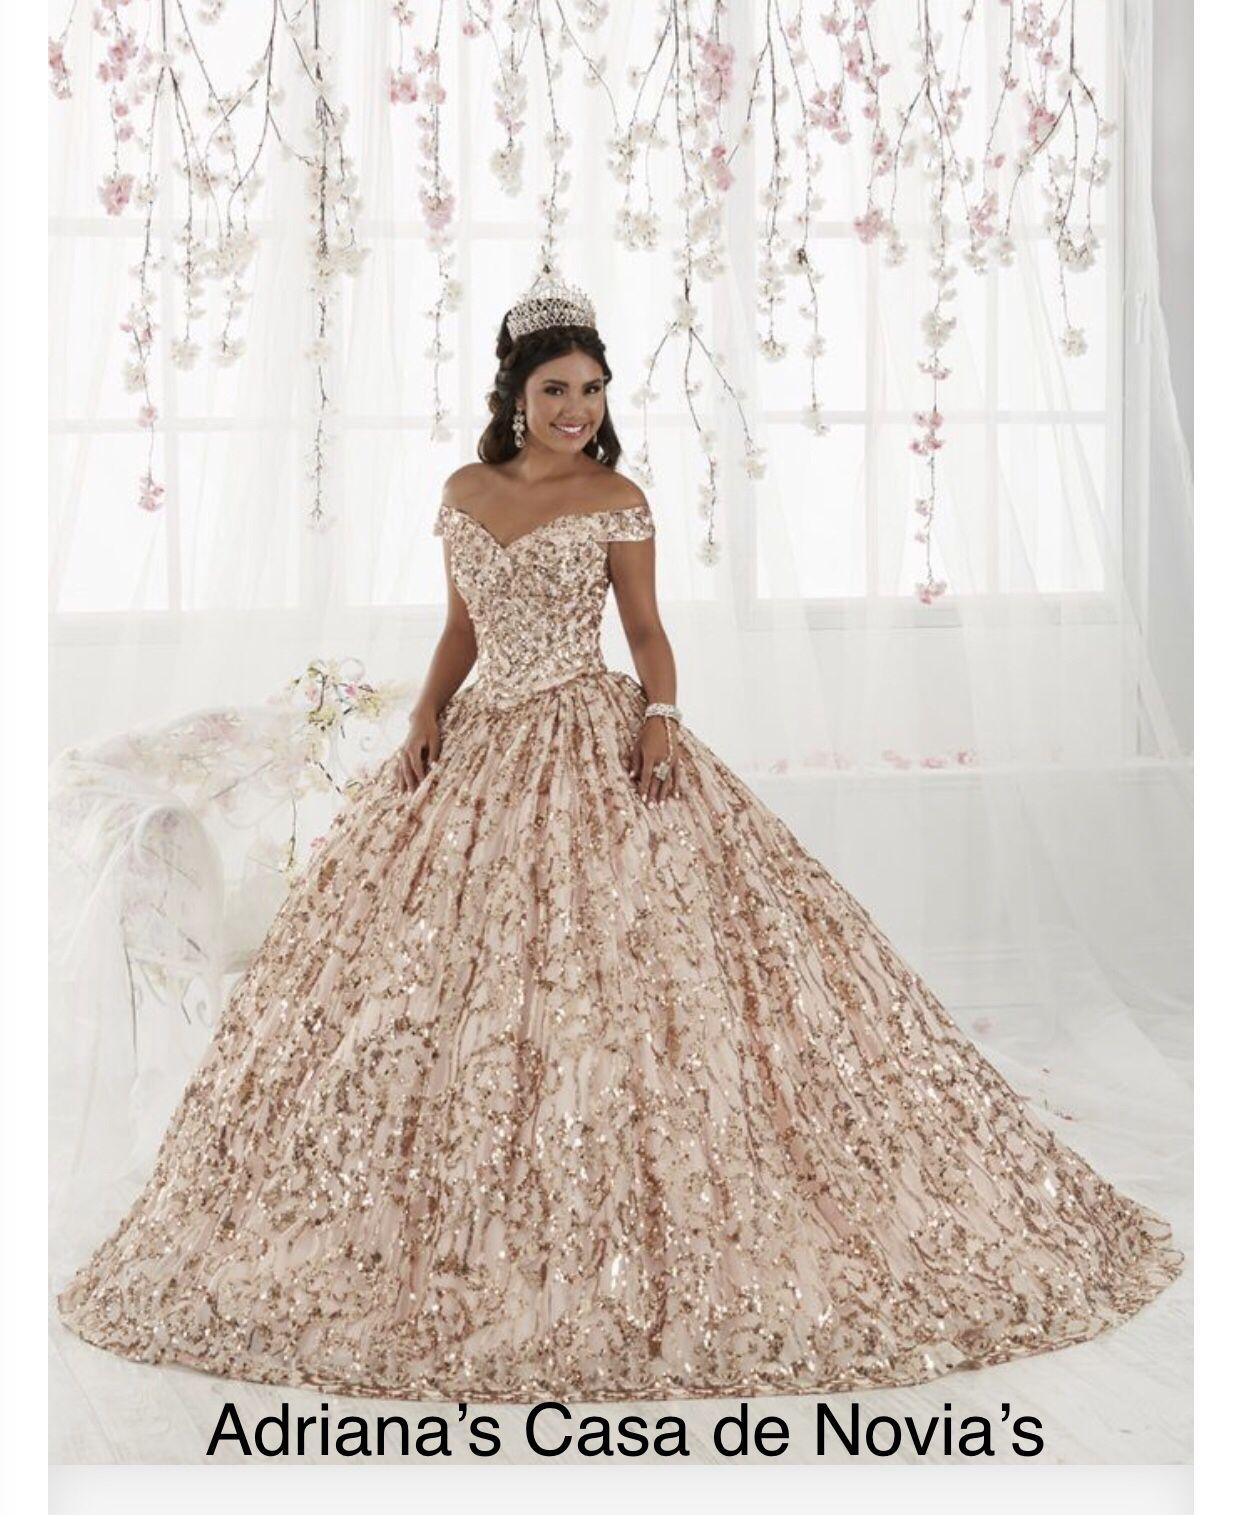 ca768ac323d Quinceanera dresses and vestidos de quinceanera for your big day! Unique quinceanera  dresses that you will love!